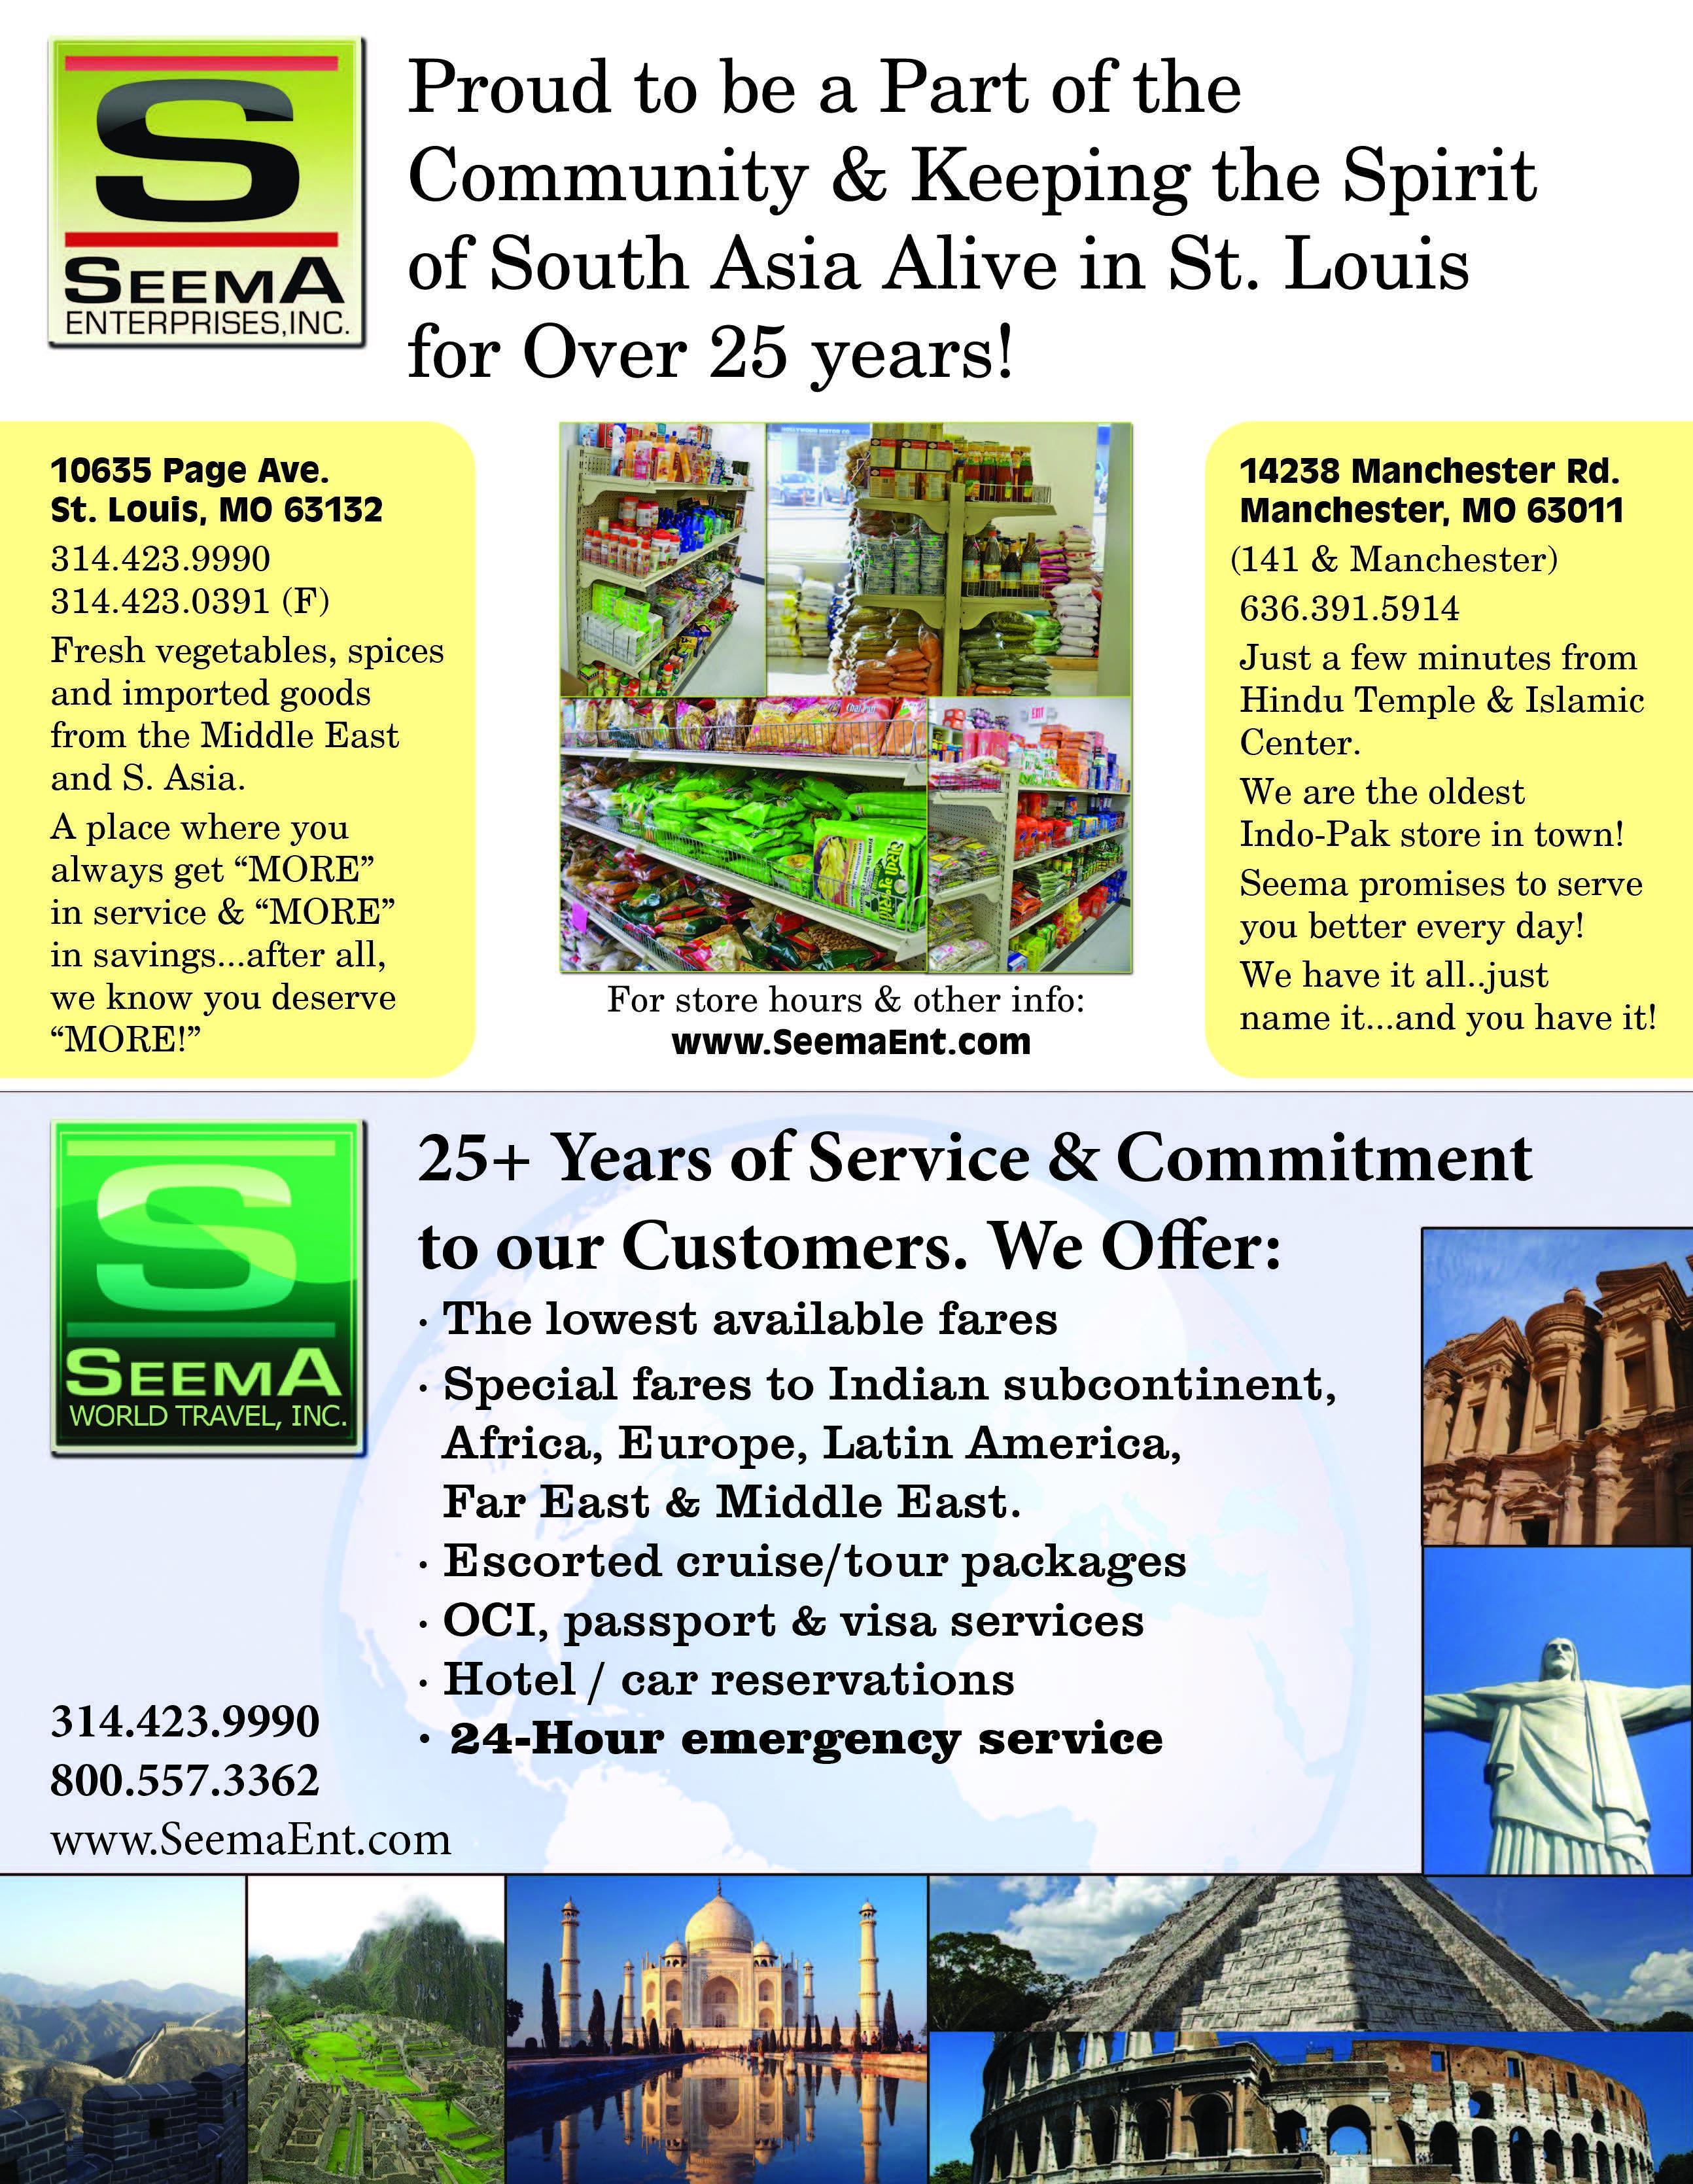 Seema World Travel Inc